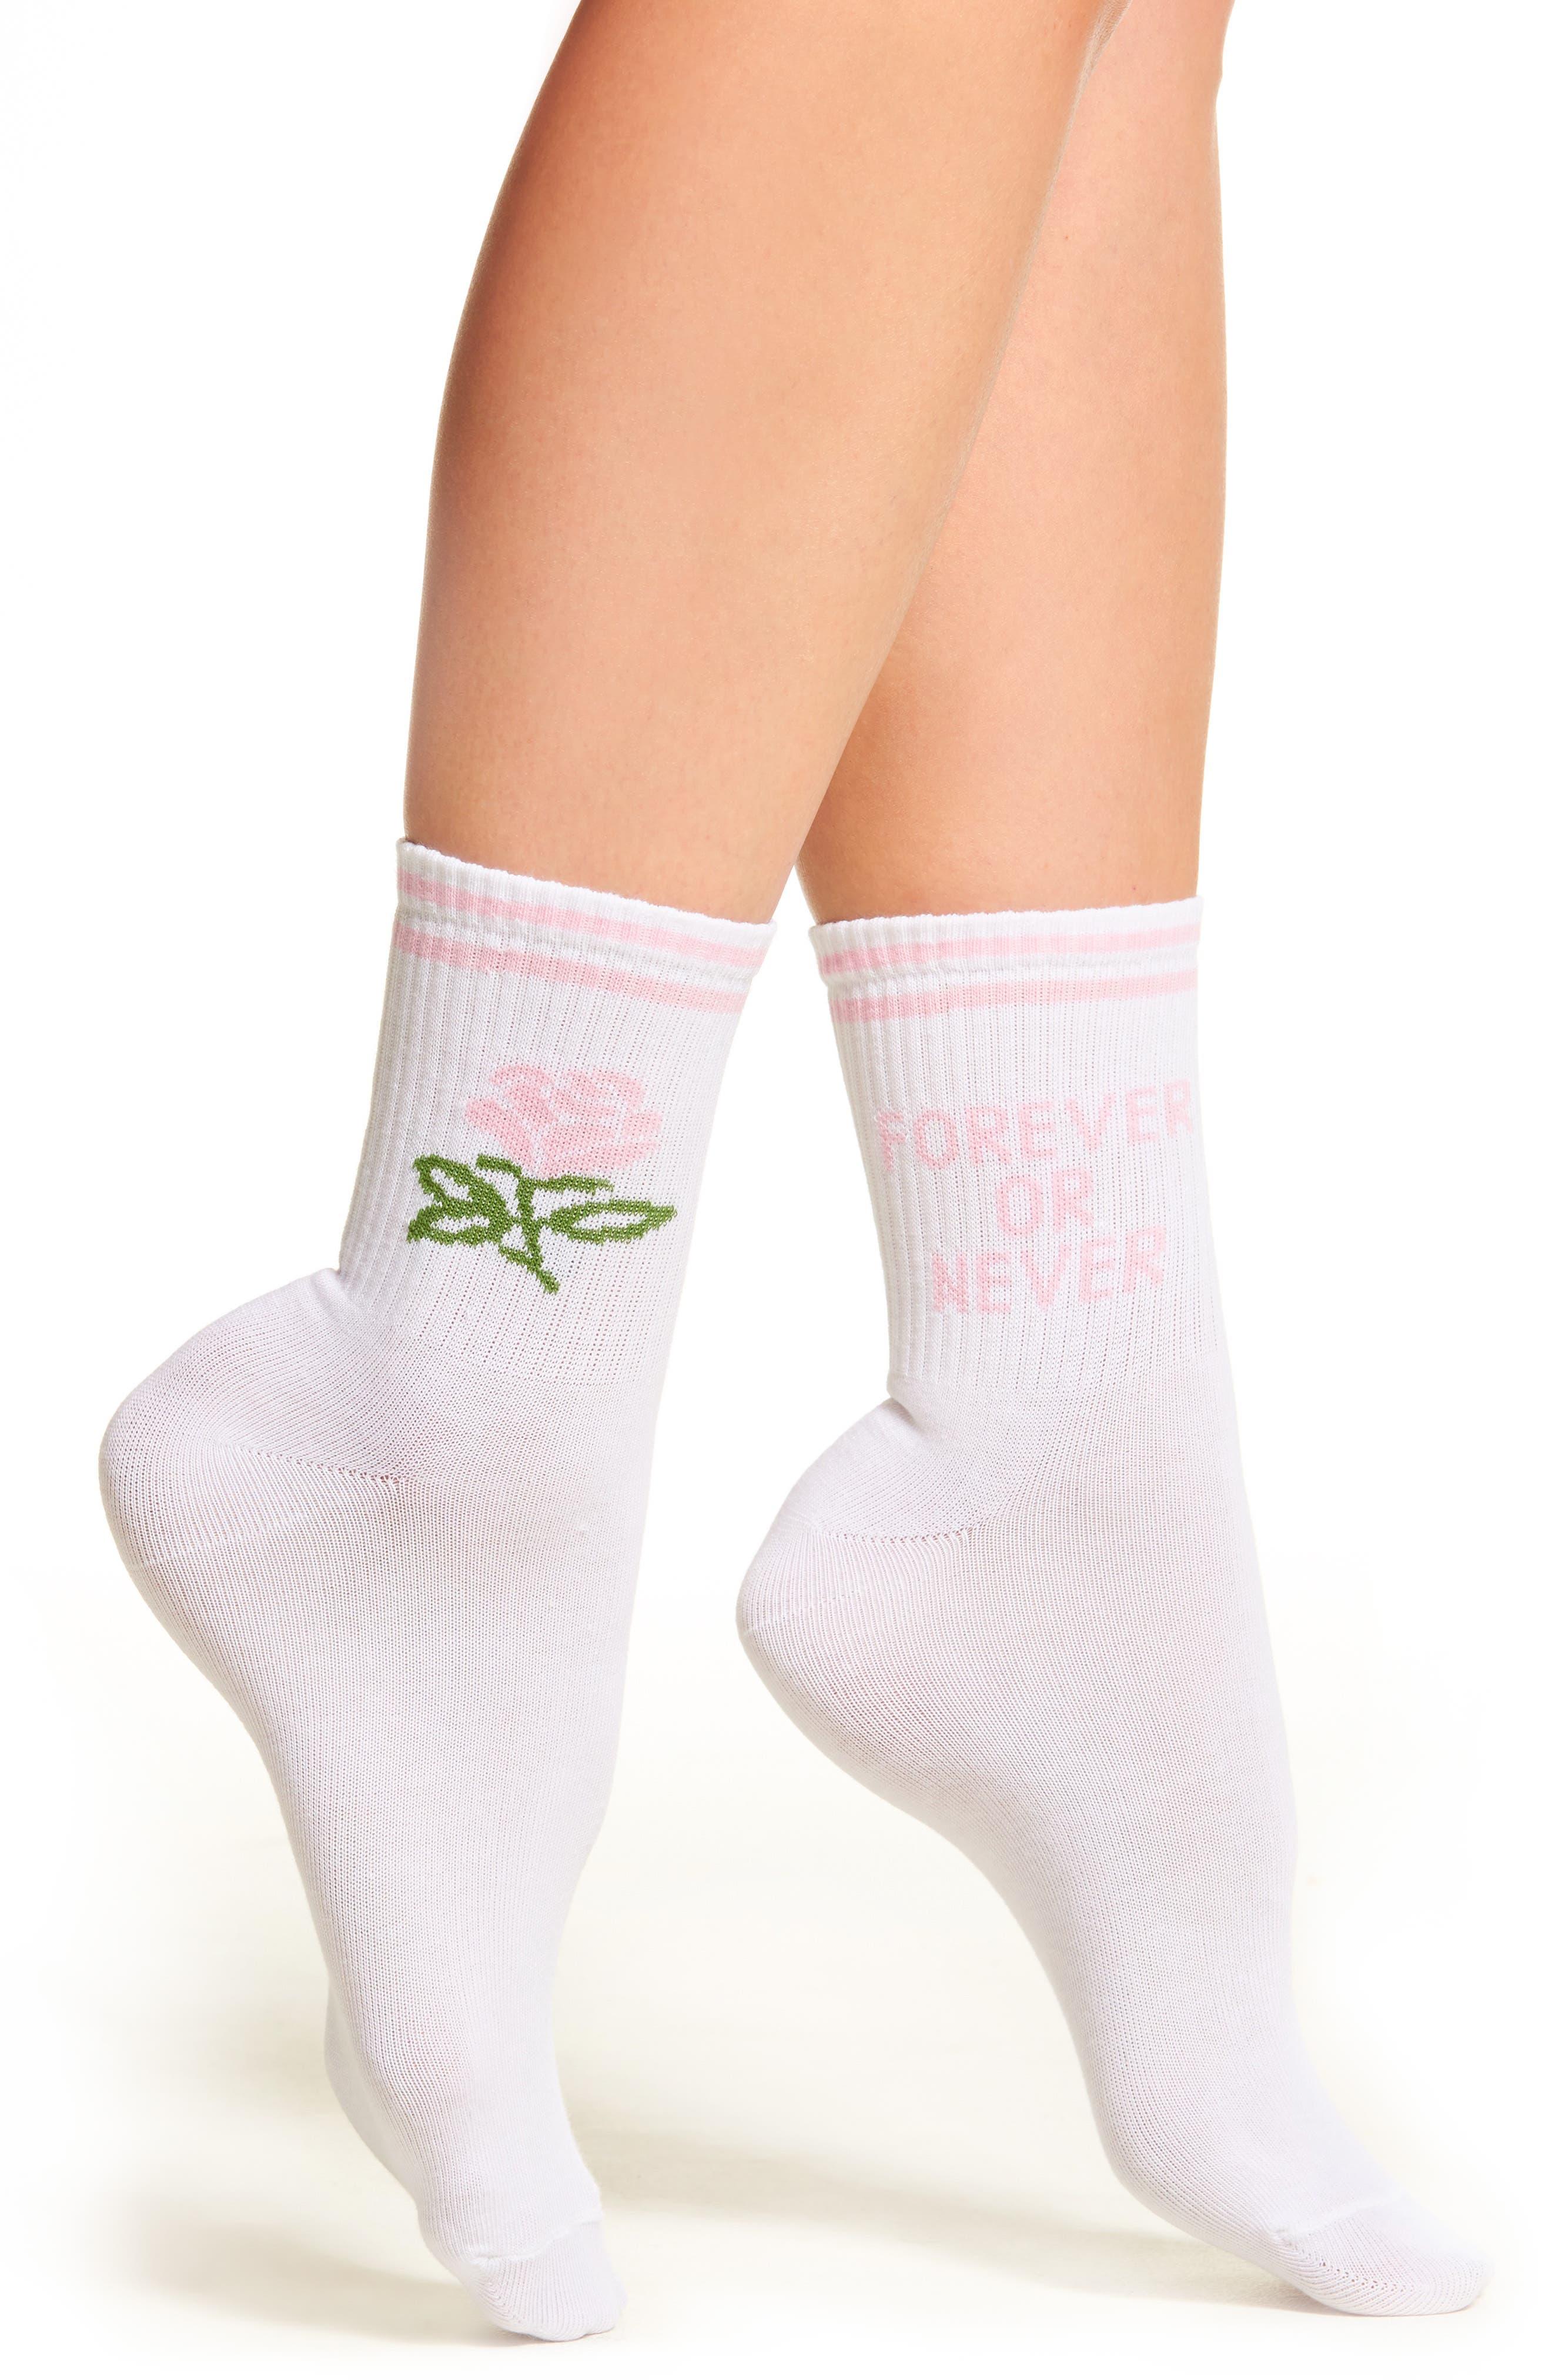 Forever or Never Socks,                         Main,                         color, White Pink